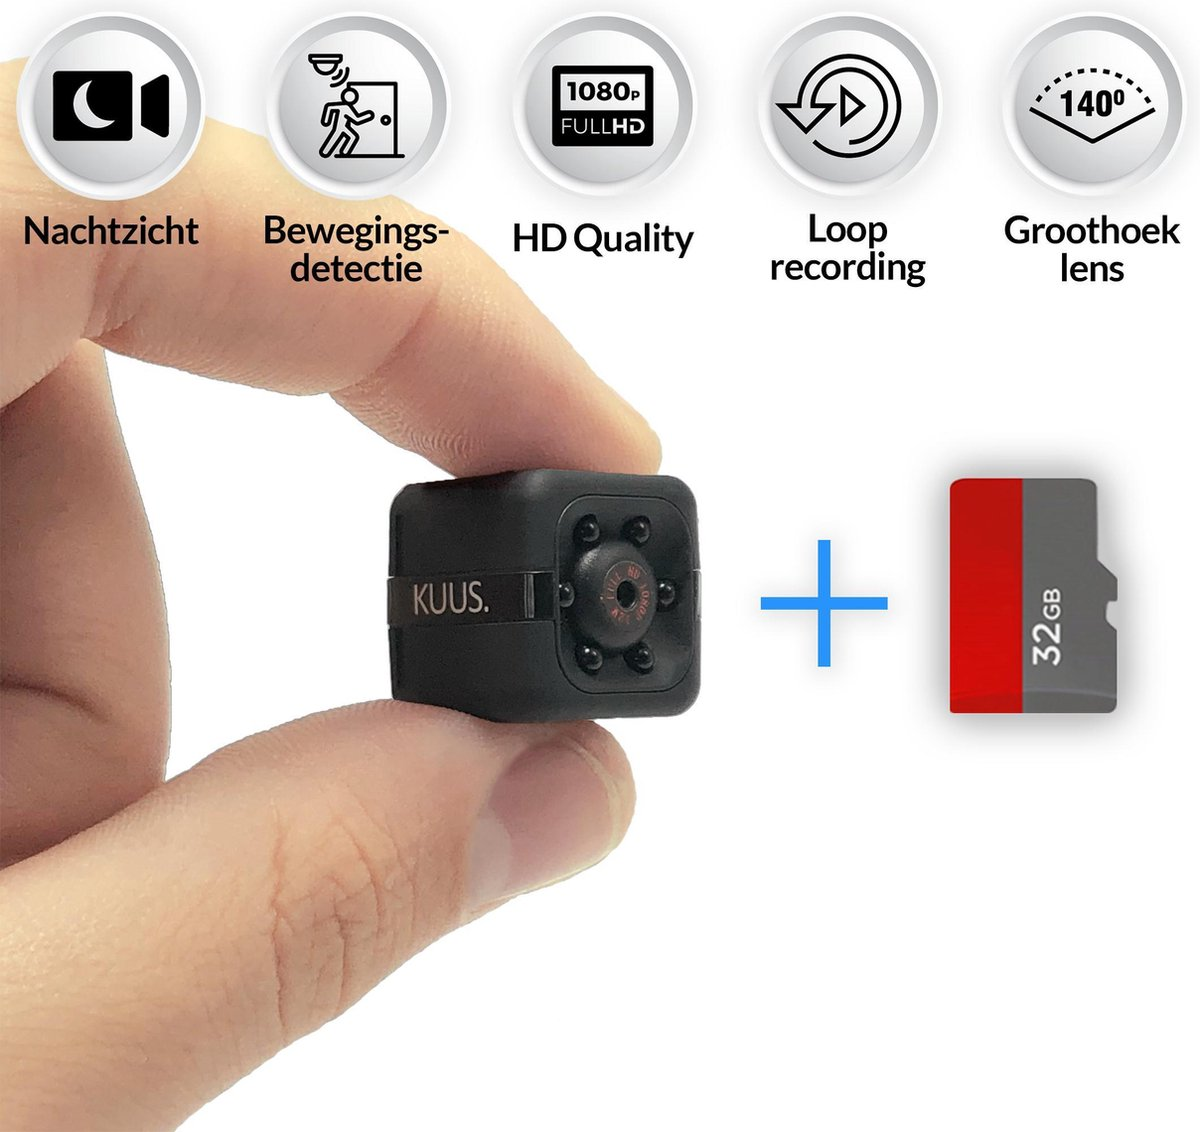 KUUS. Mini verborgen spy camera, beveiligingscamera.   Met 32 GB geheugenkaart   FULL HD 1080P